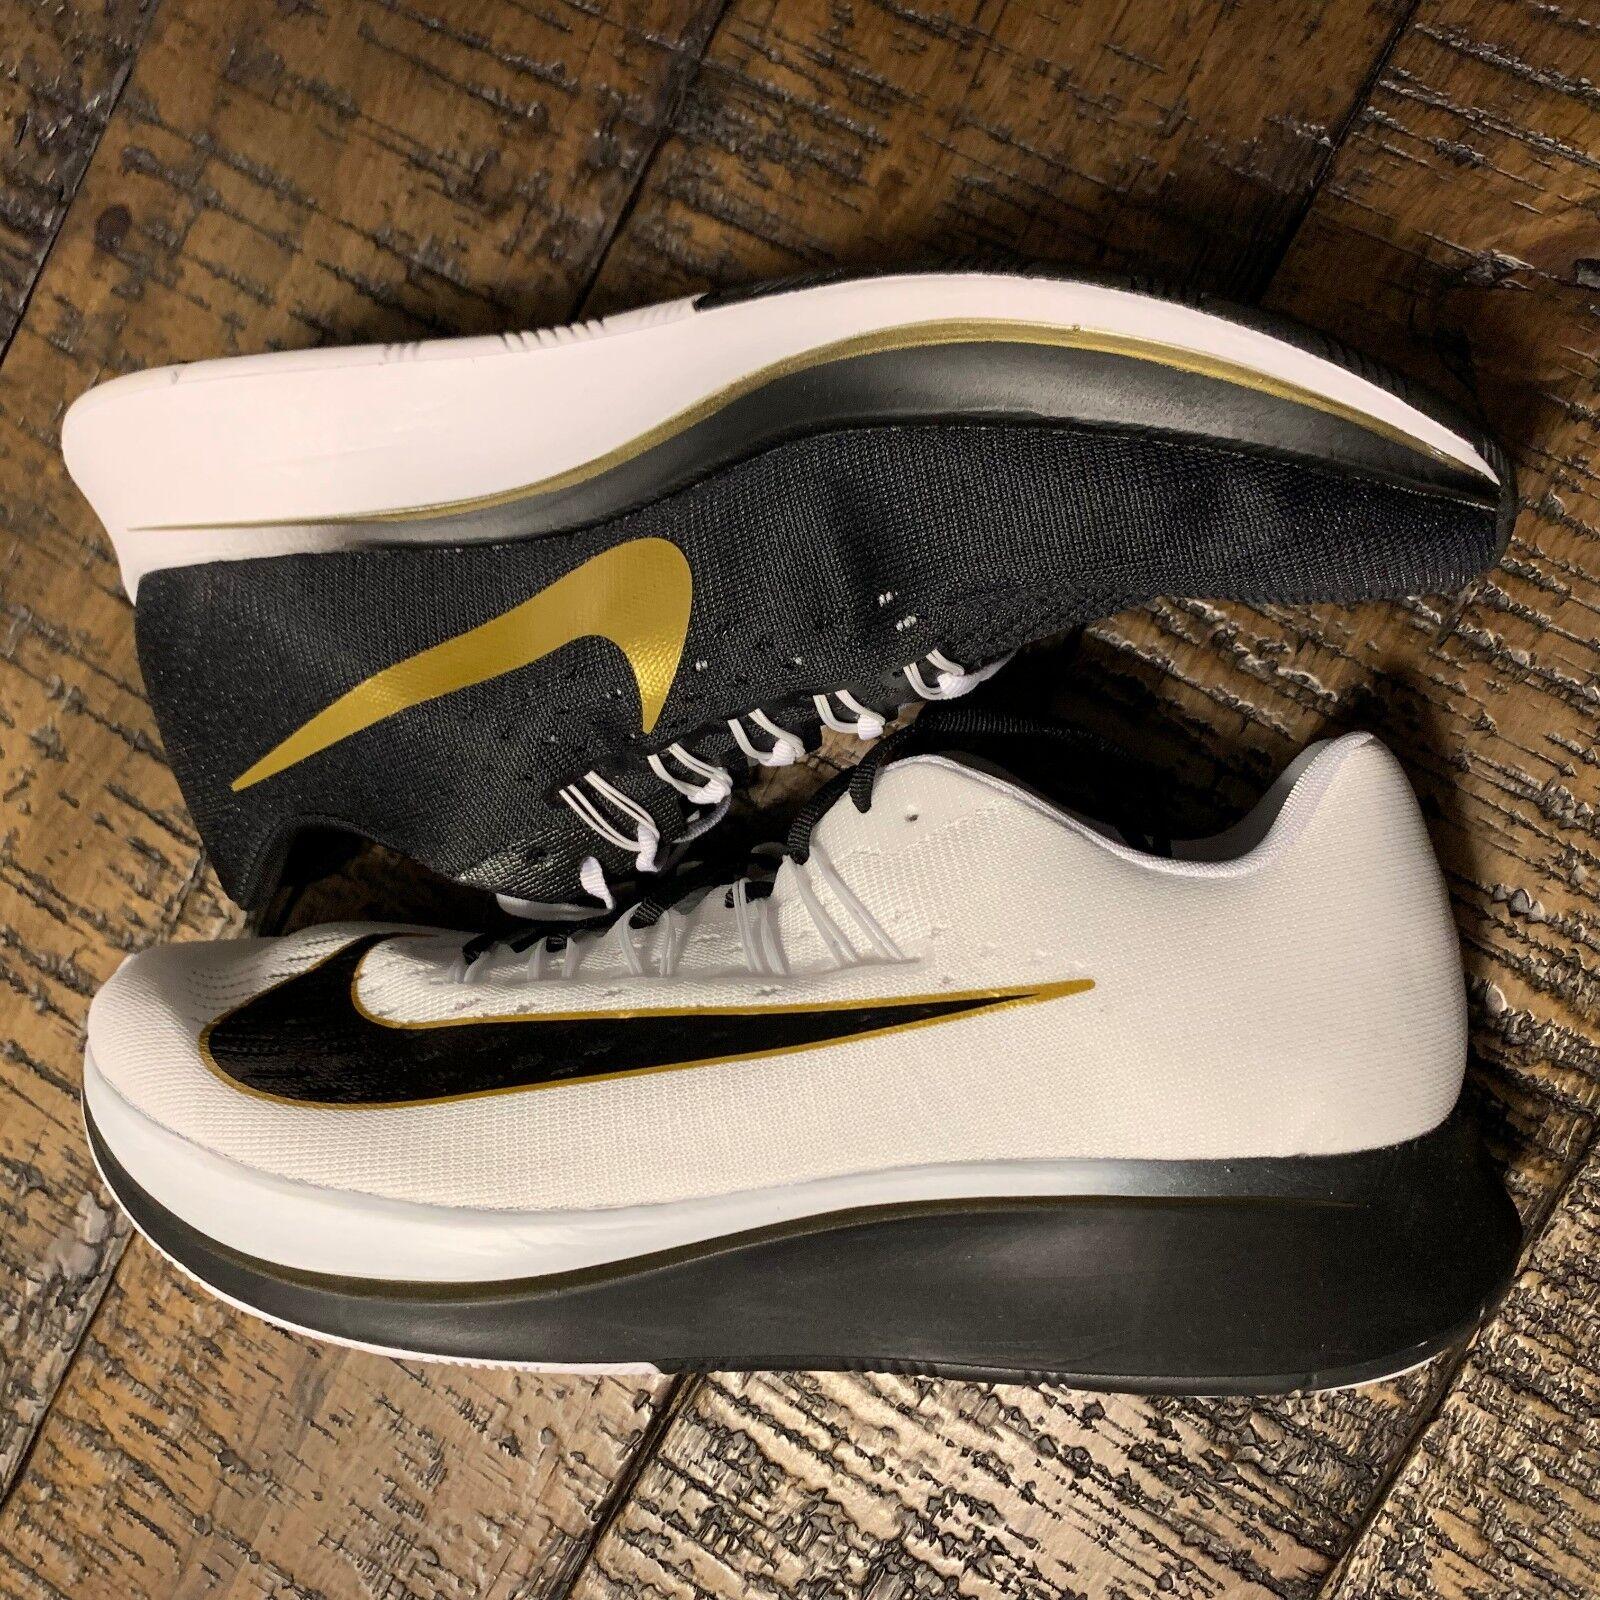 Nike Zoom Fly  Mismatch  880848-006 Black White gold Men's SZ 12 NO BOX TOP